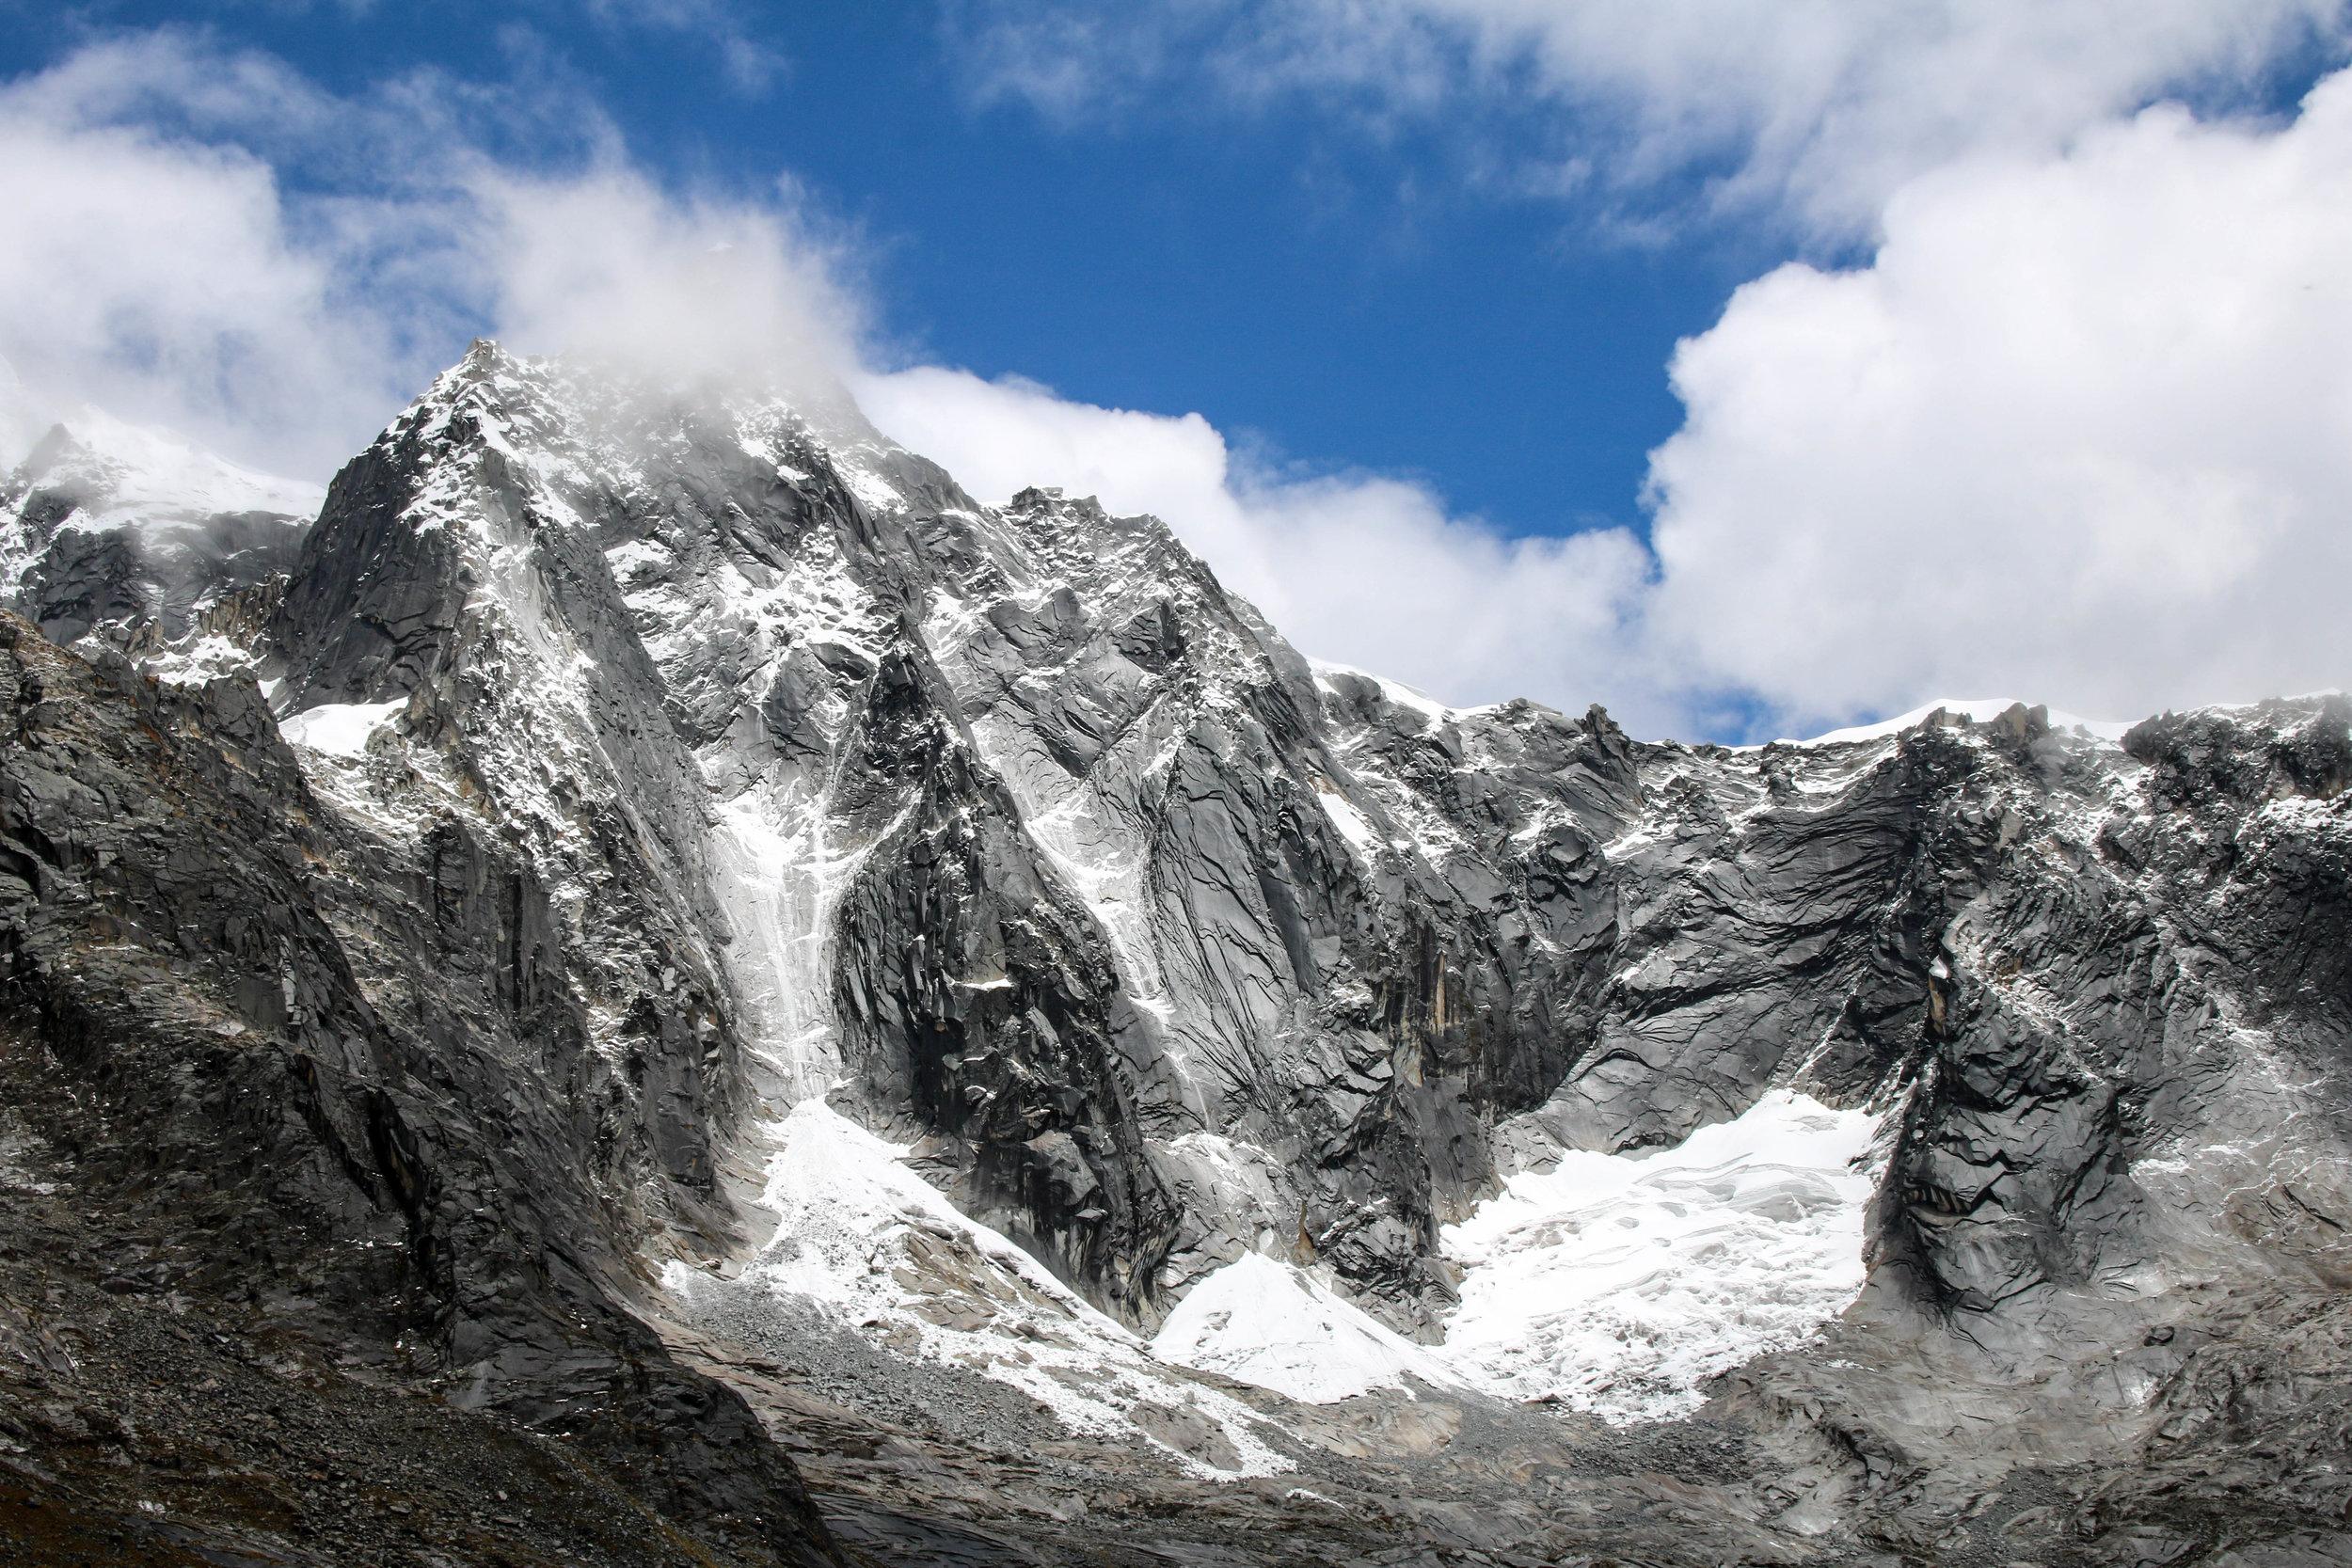 Mountain Rock, Peru